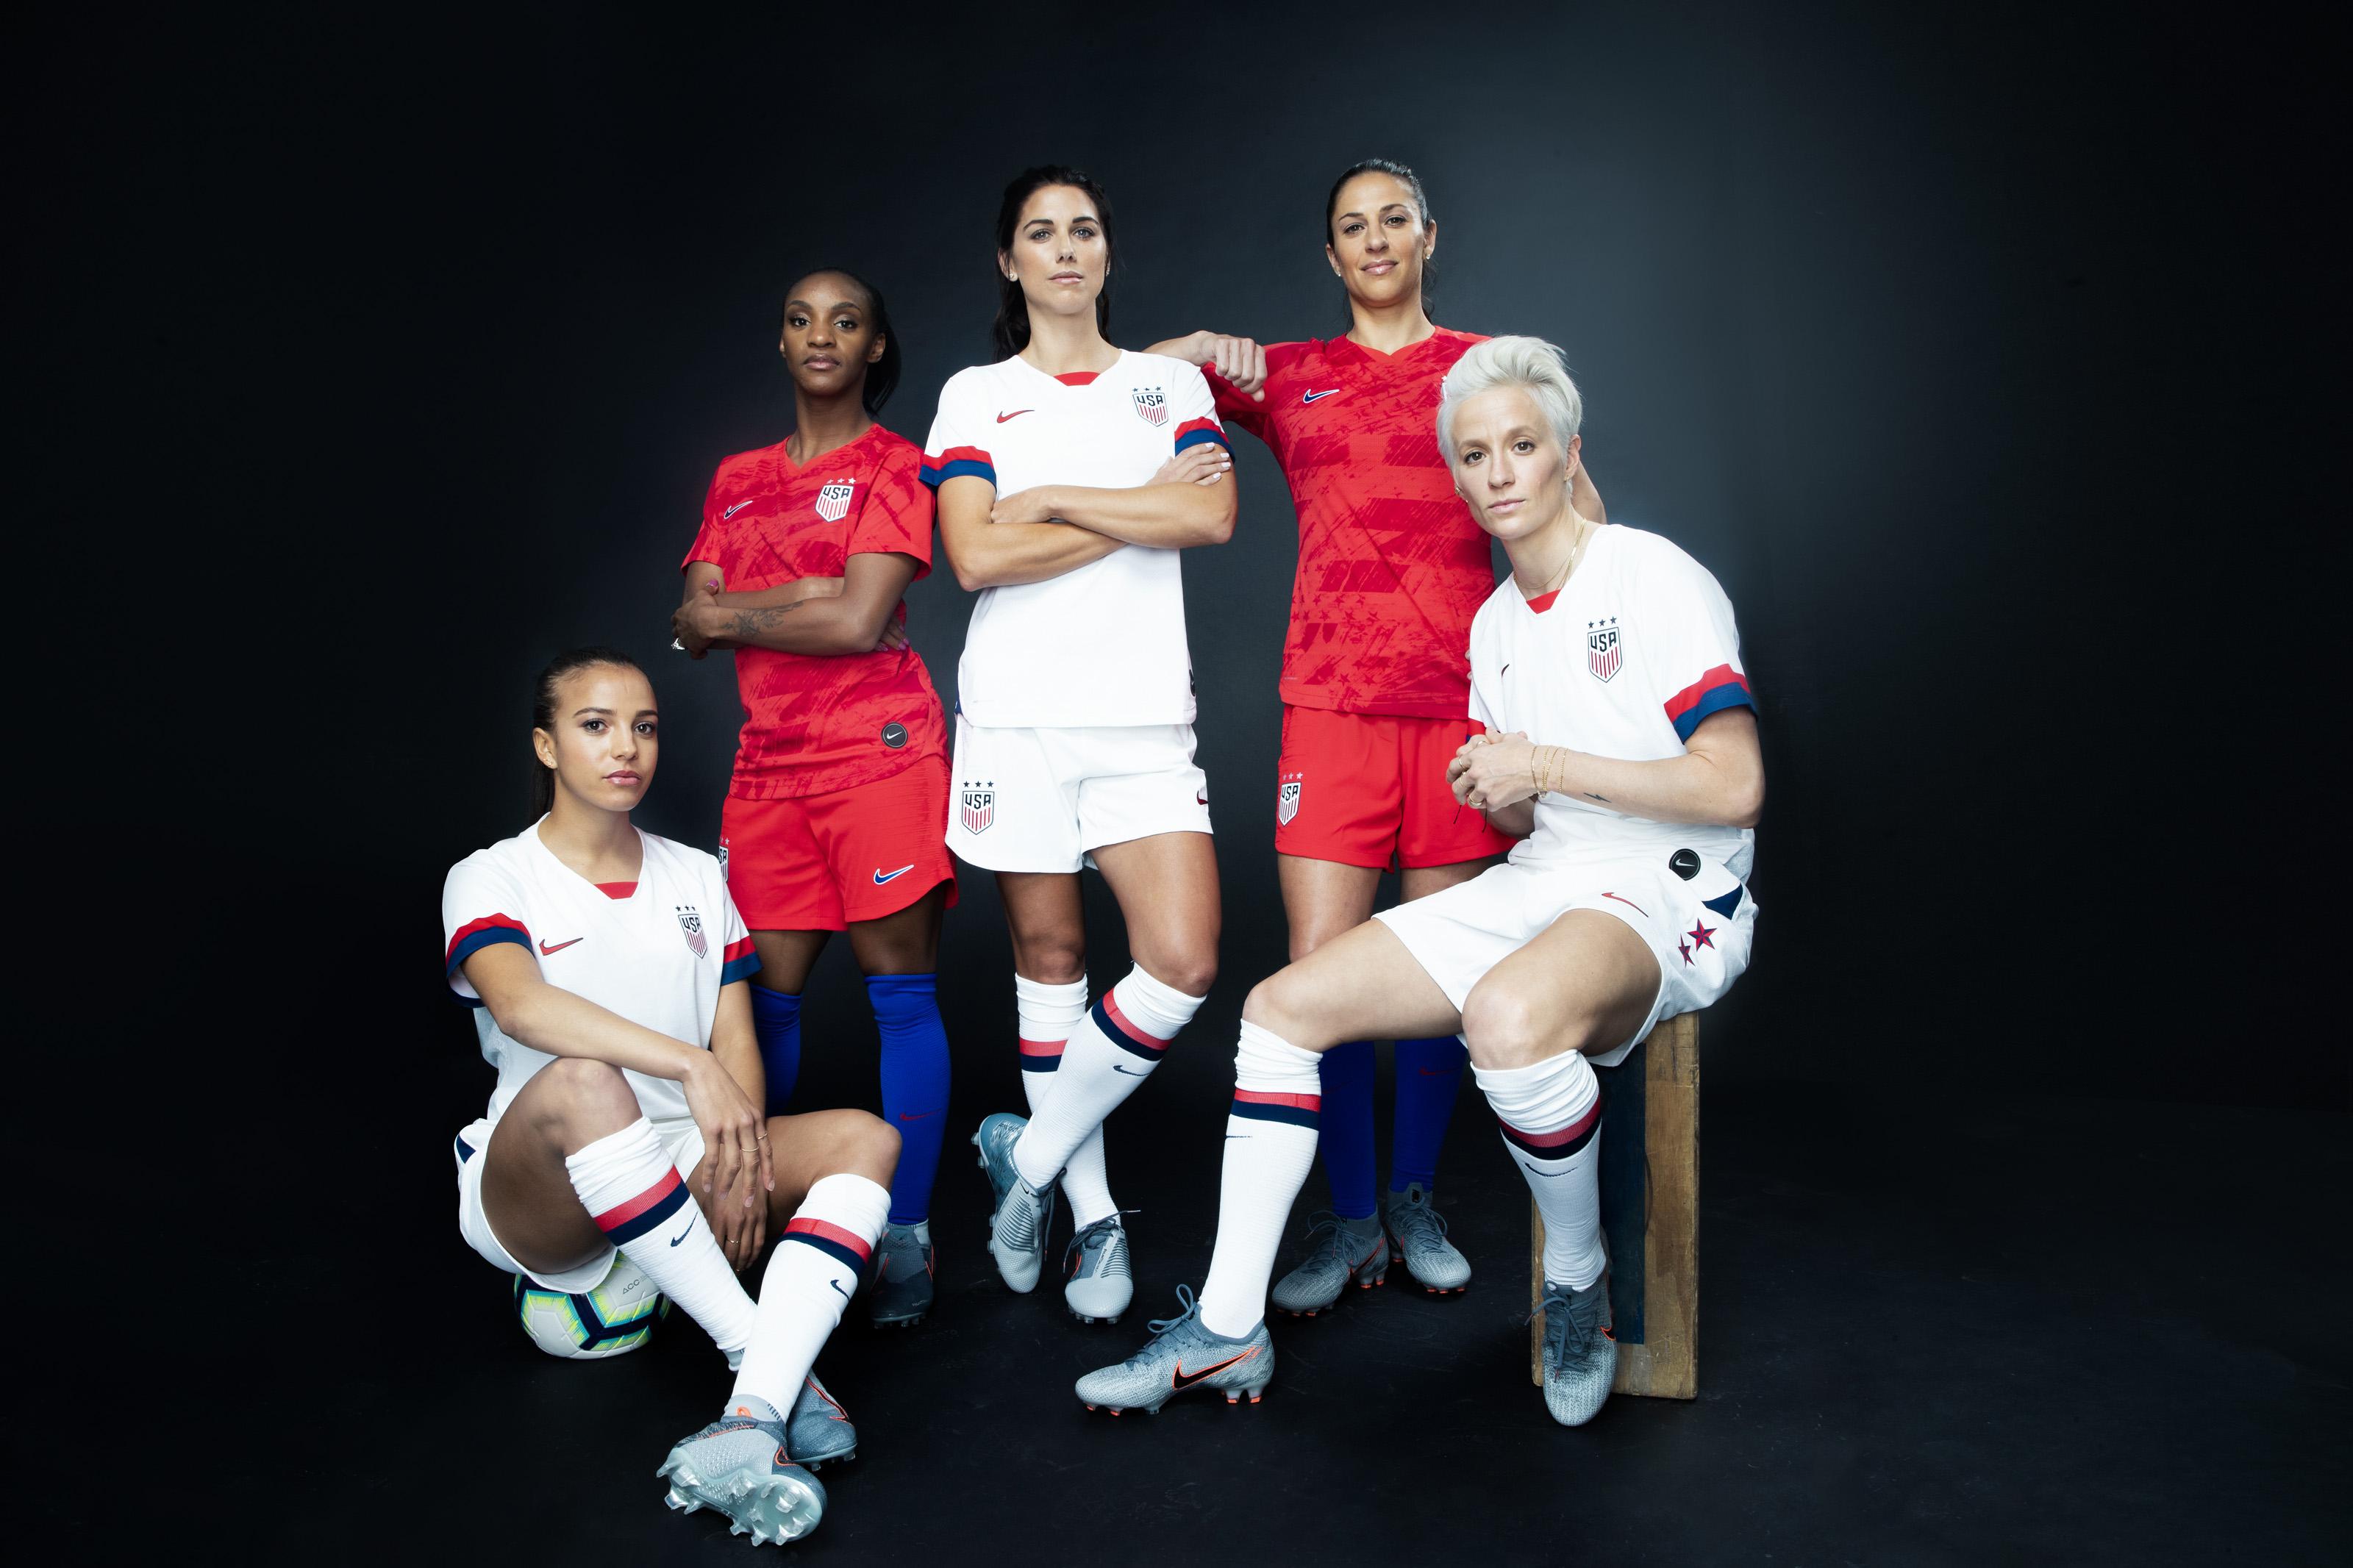 USA WWC National team kit